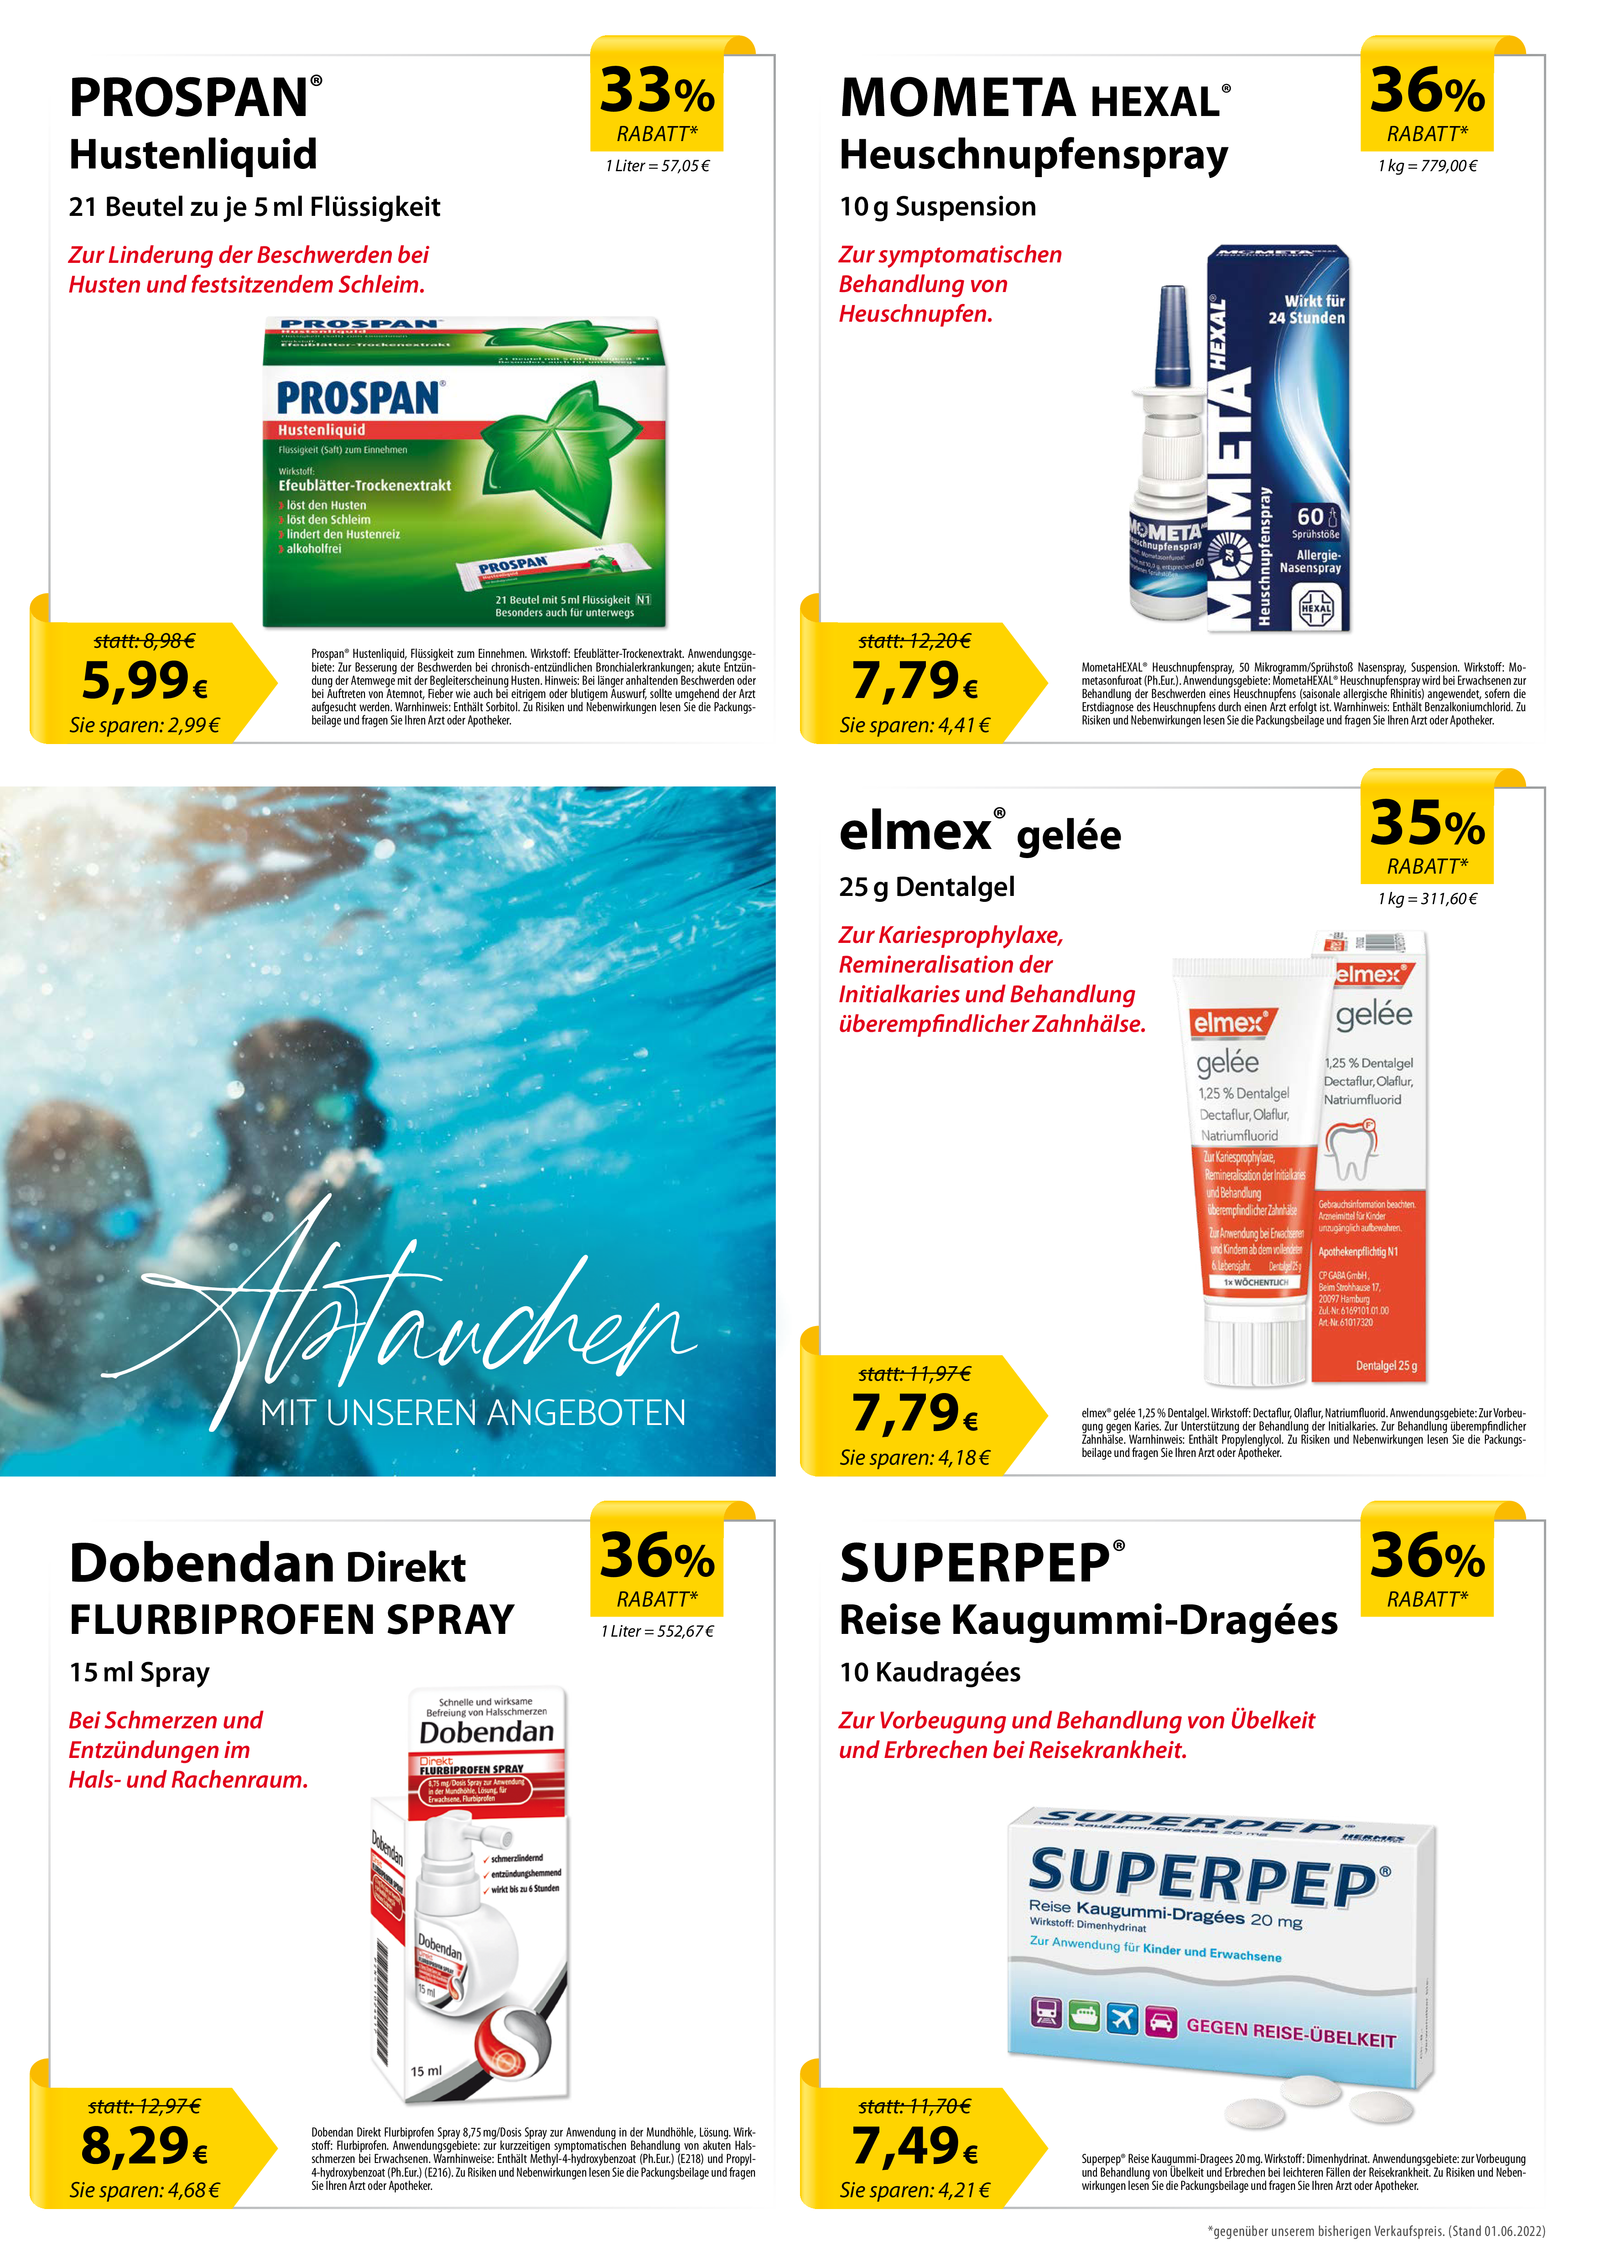 https://mein-uploads.apocdn.net/1028/leaflets/1028_flyer-Seite3.png